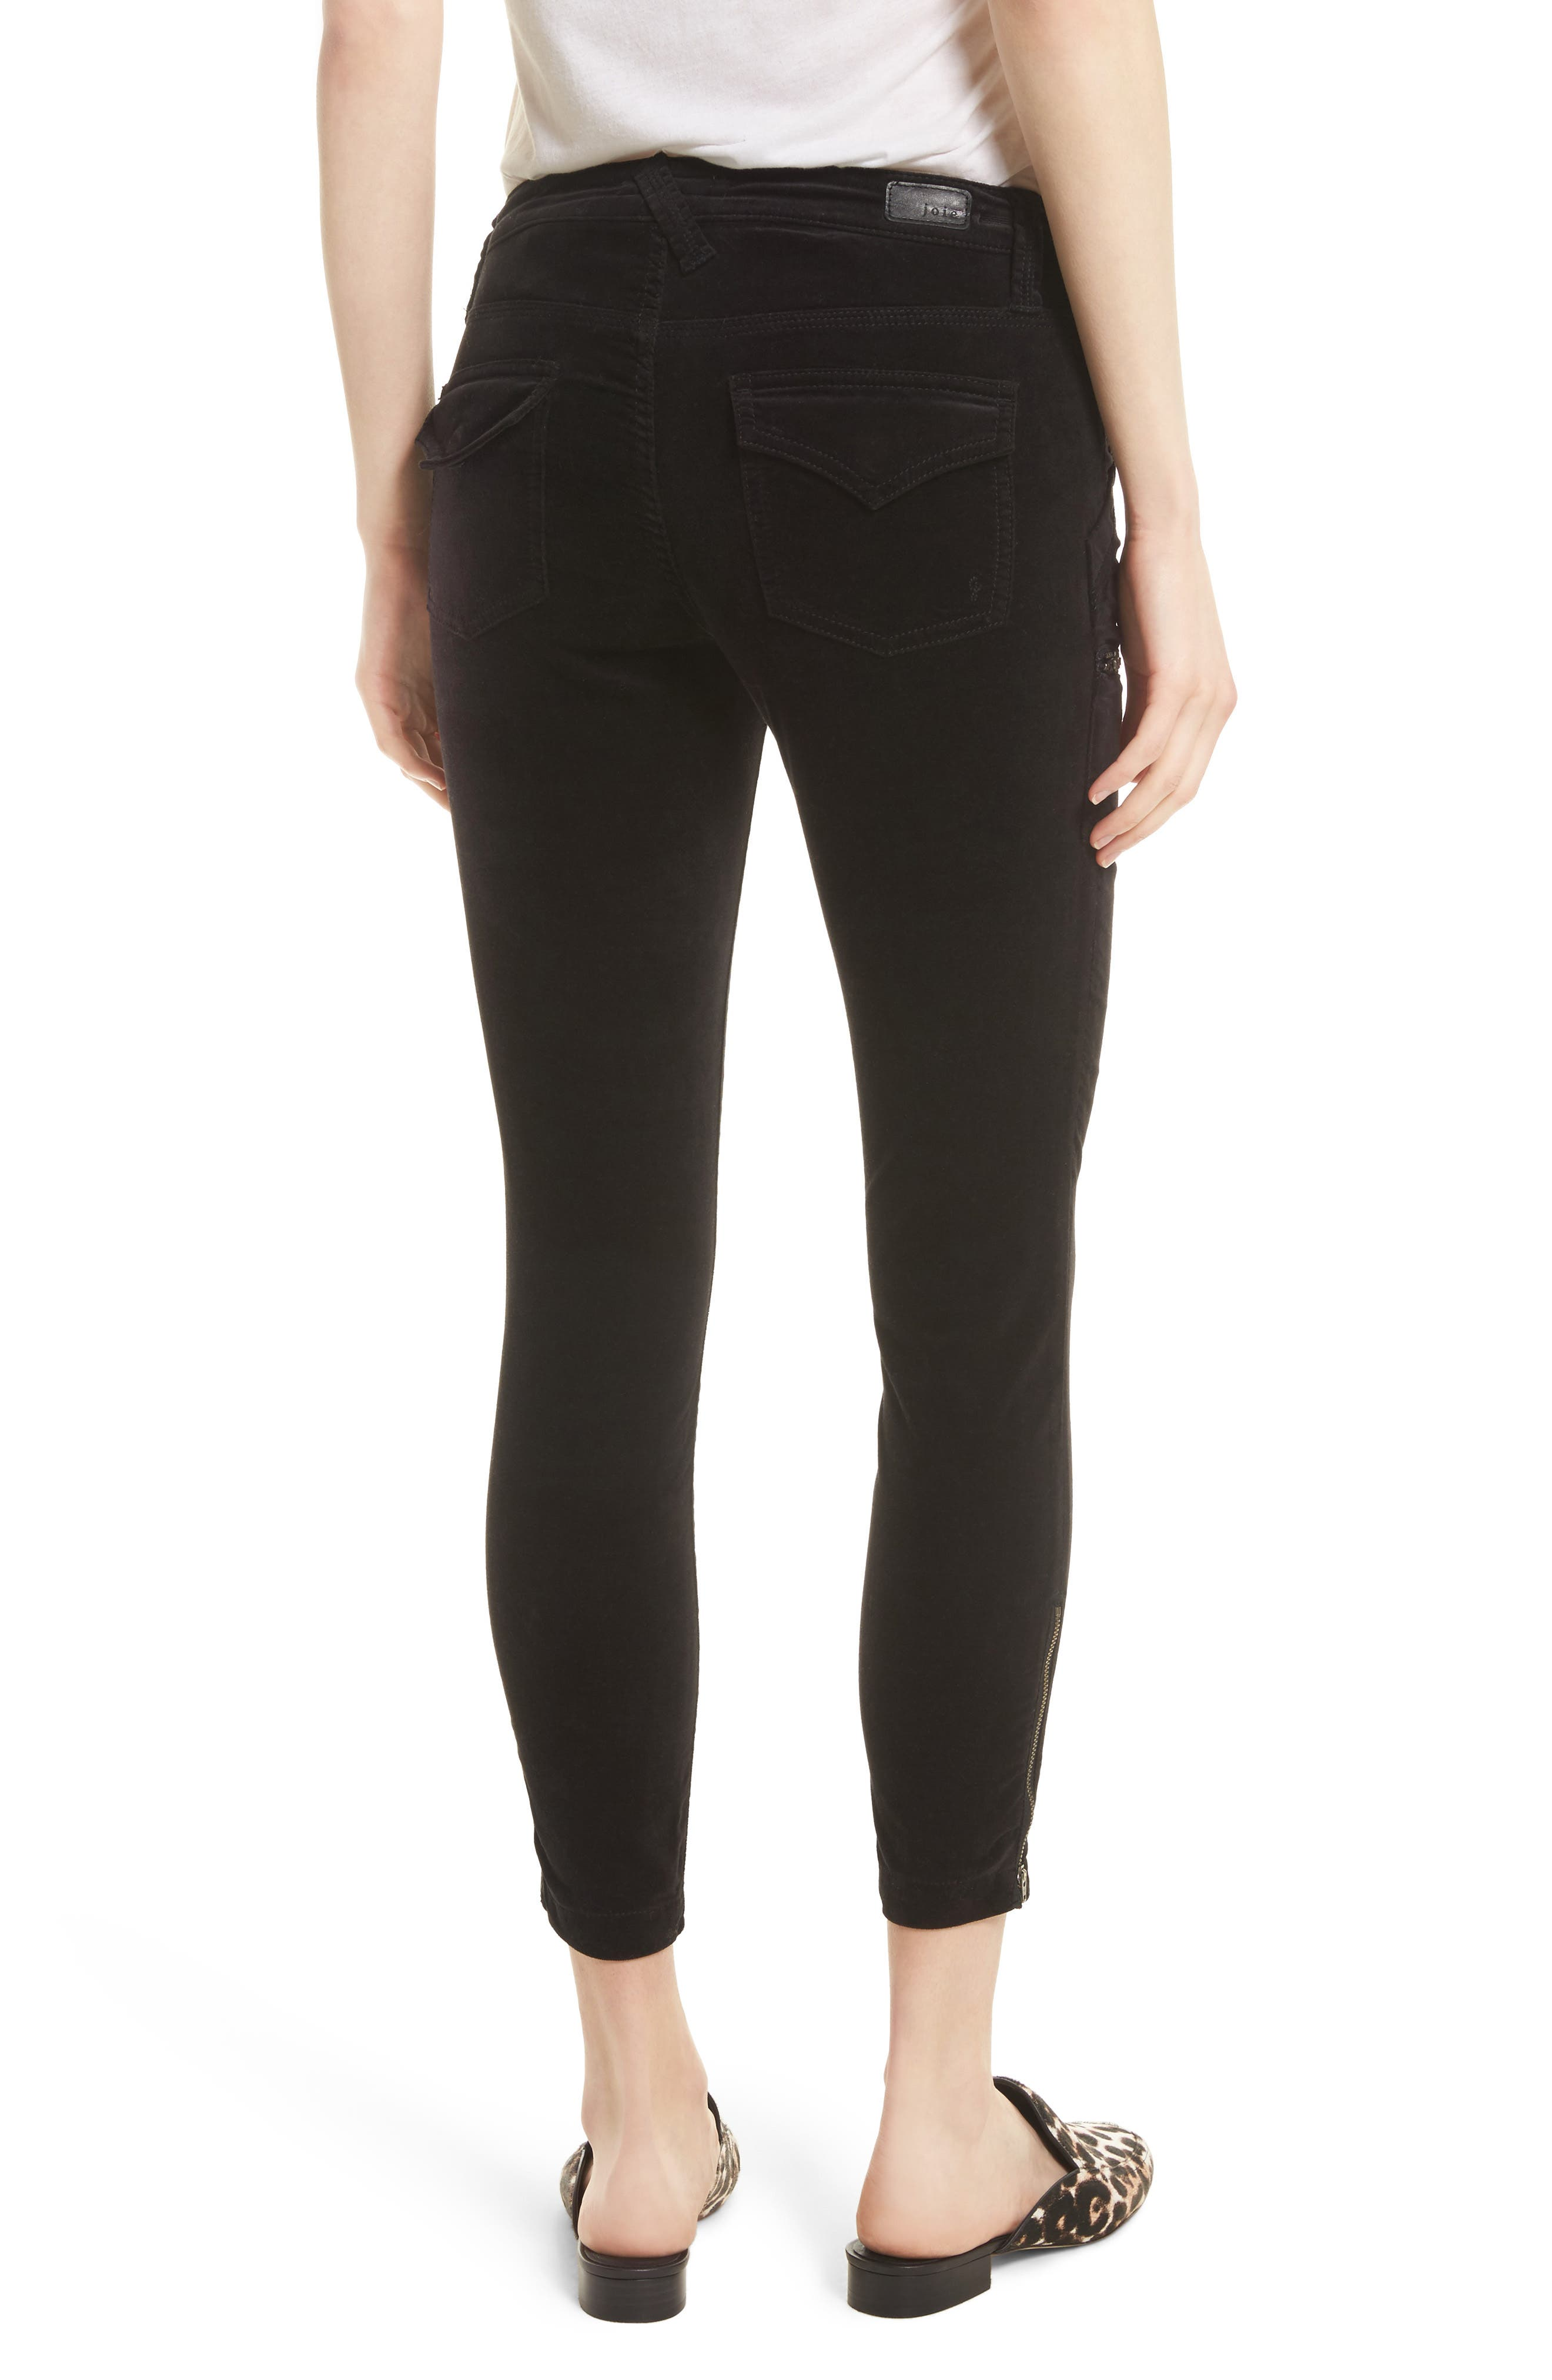 Park Stretch Cotton Skinny Pants,                             Alternate thumbnail 2, color,                             Caviar